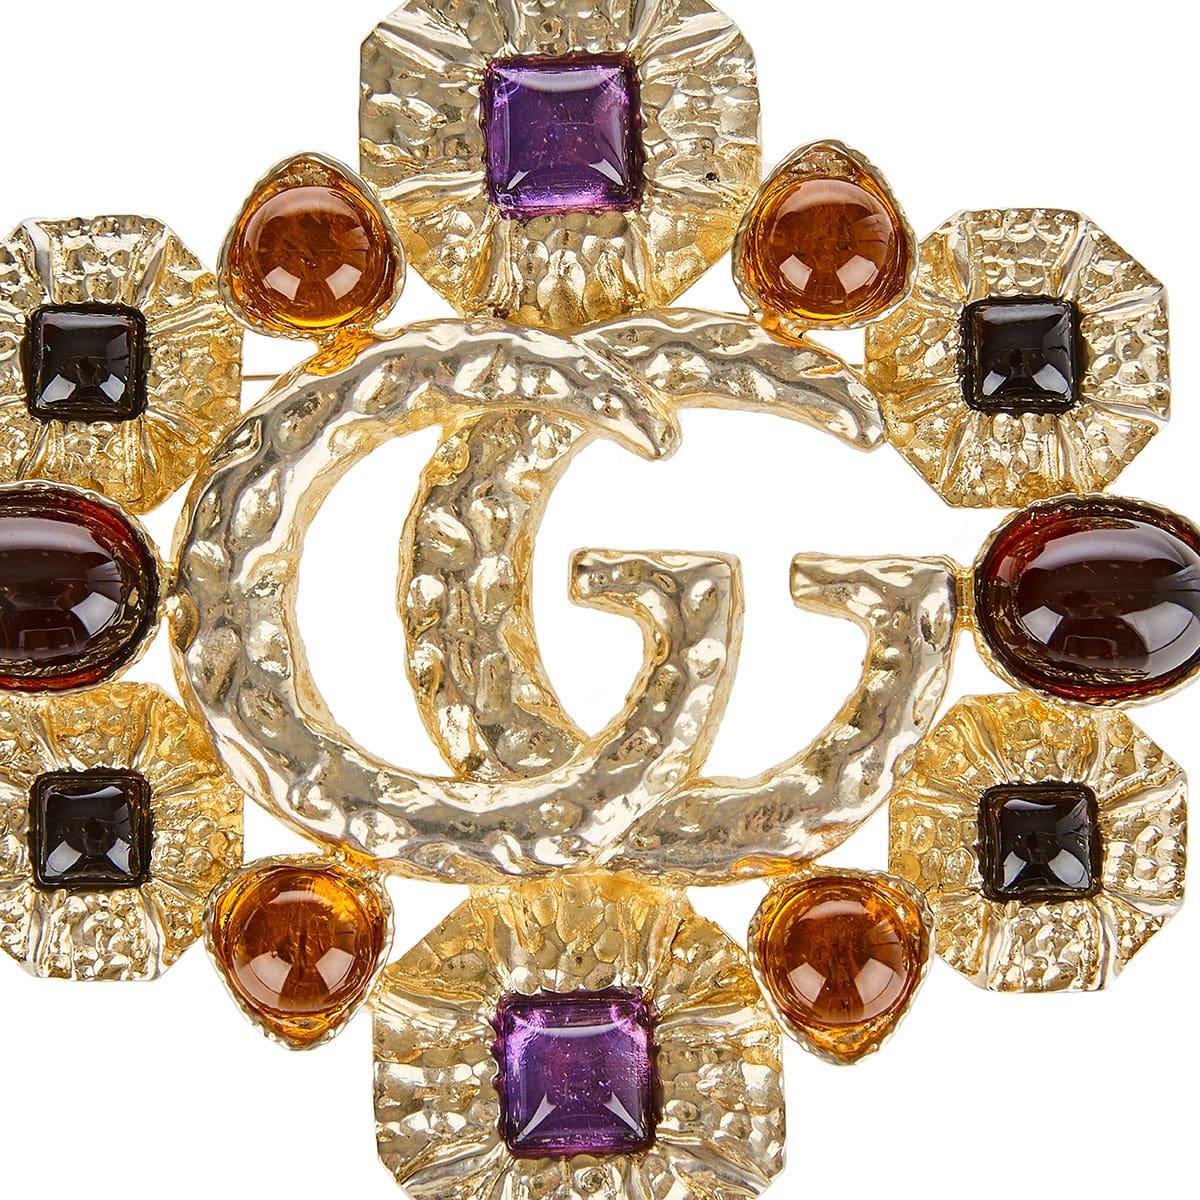 GG stone-embellished brooch